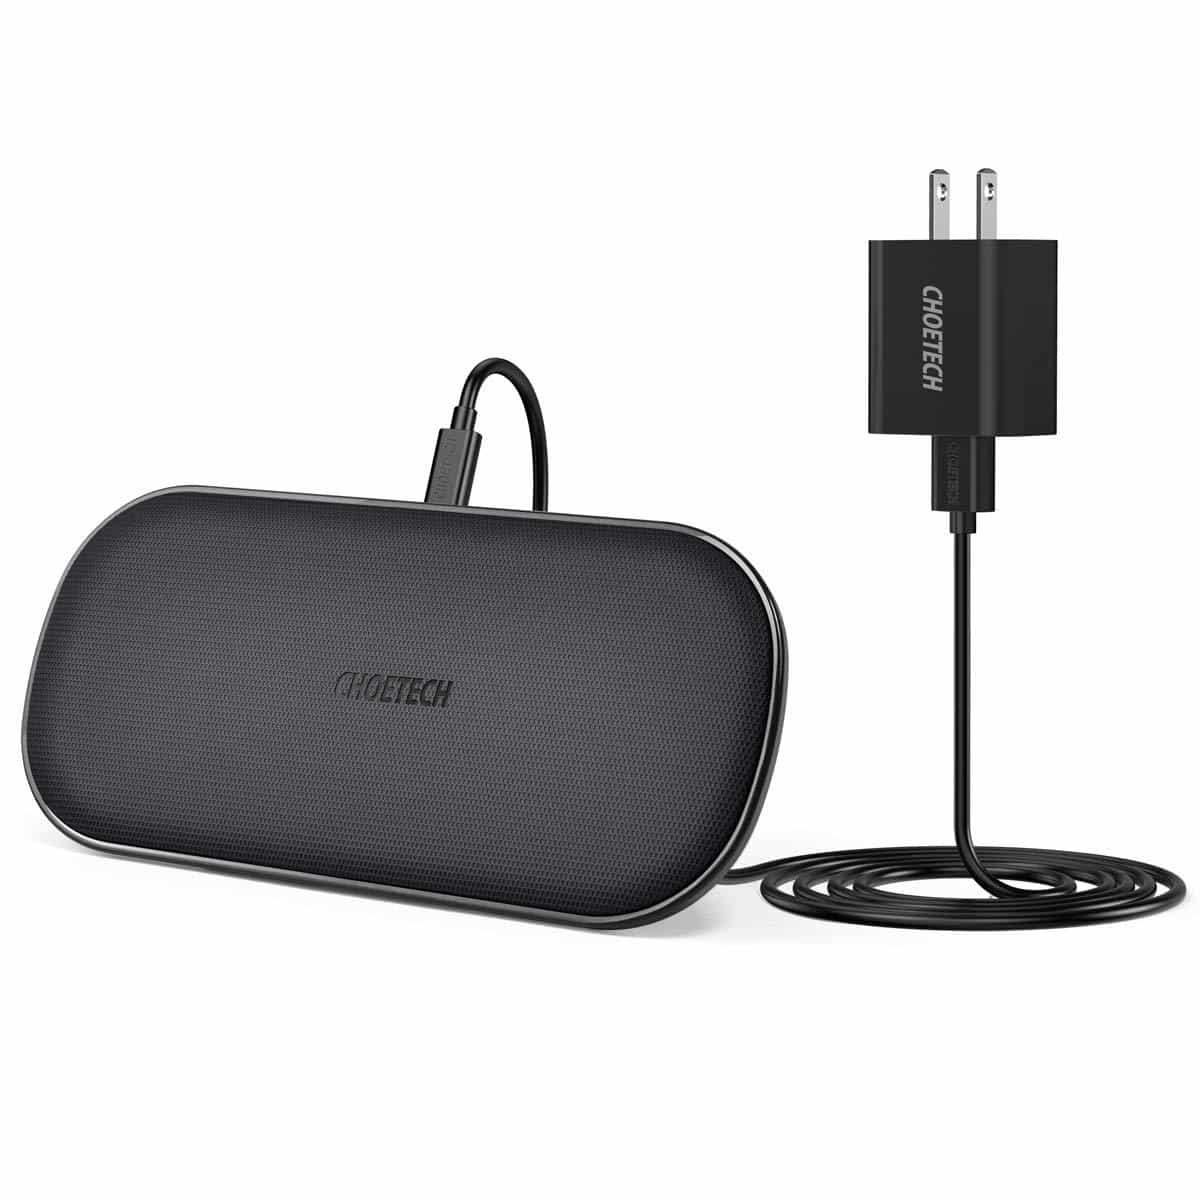 CHOETECH Dual Wireless Charger - Tech gift for women